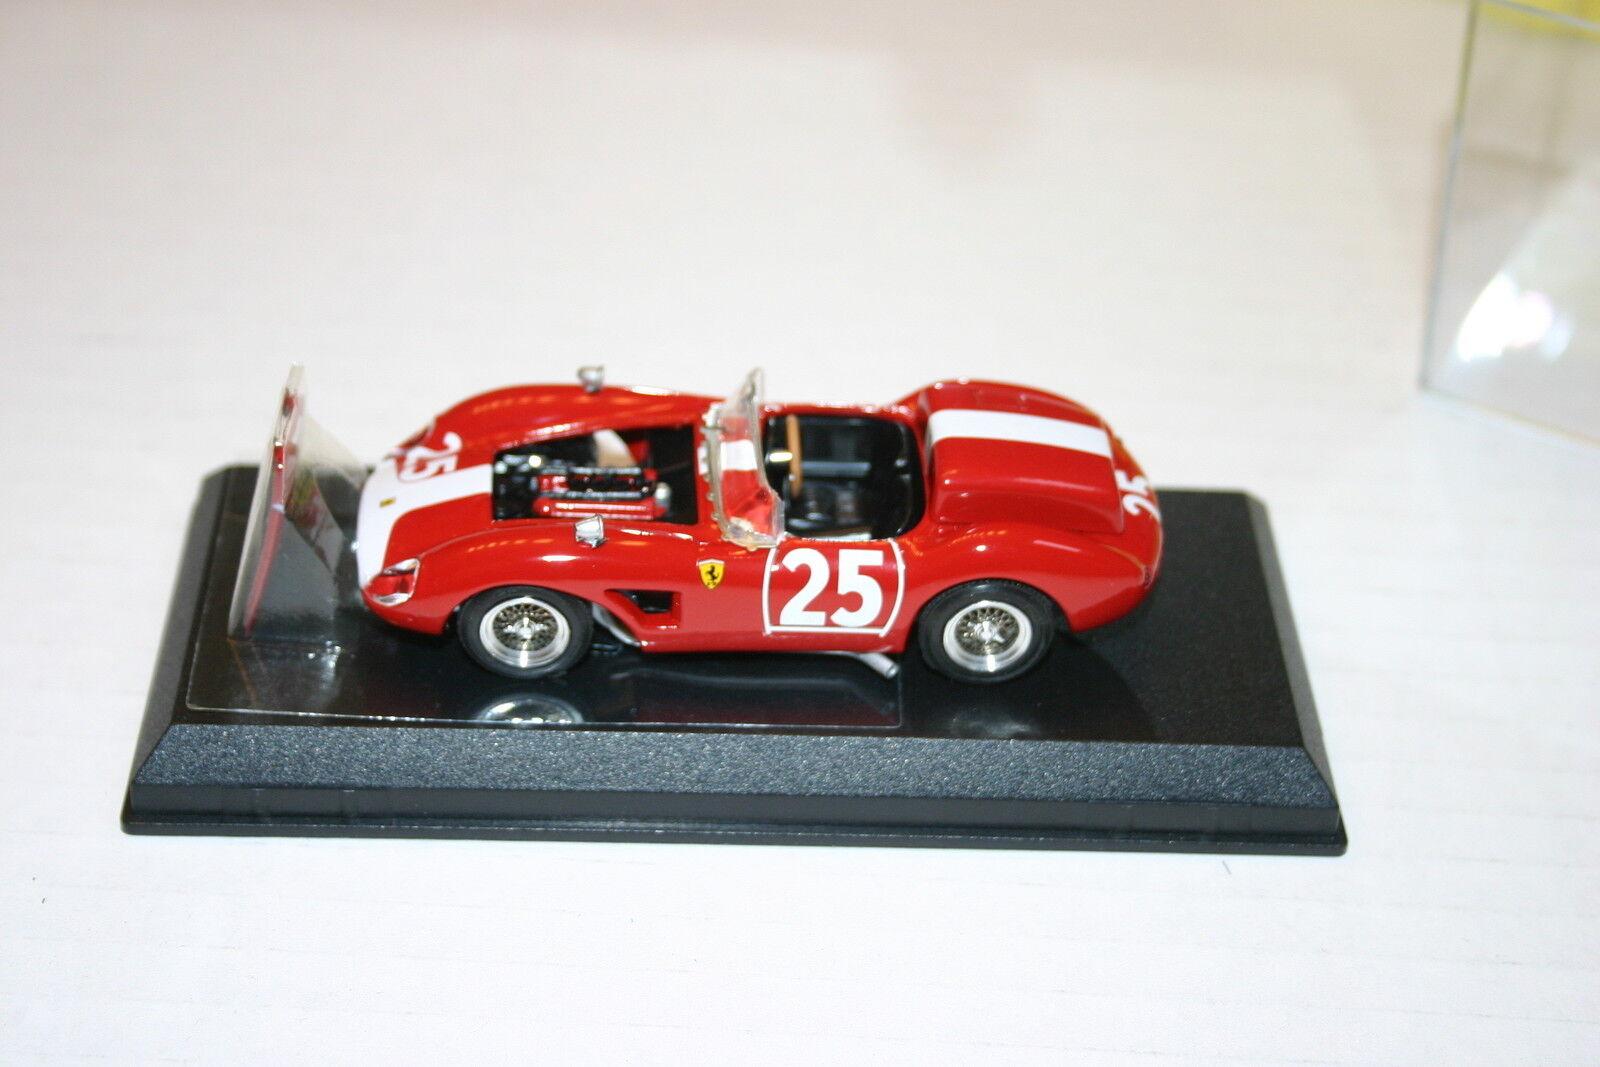 1 43 Ferrari 500 TRC 1961 Nurburgring Rojo con blancoo & Motor Detail Art Modelos